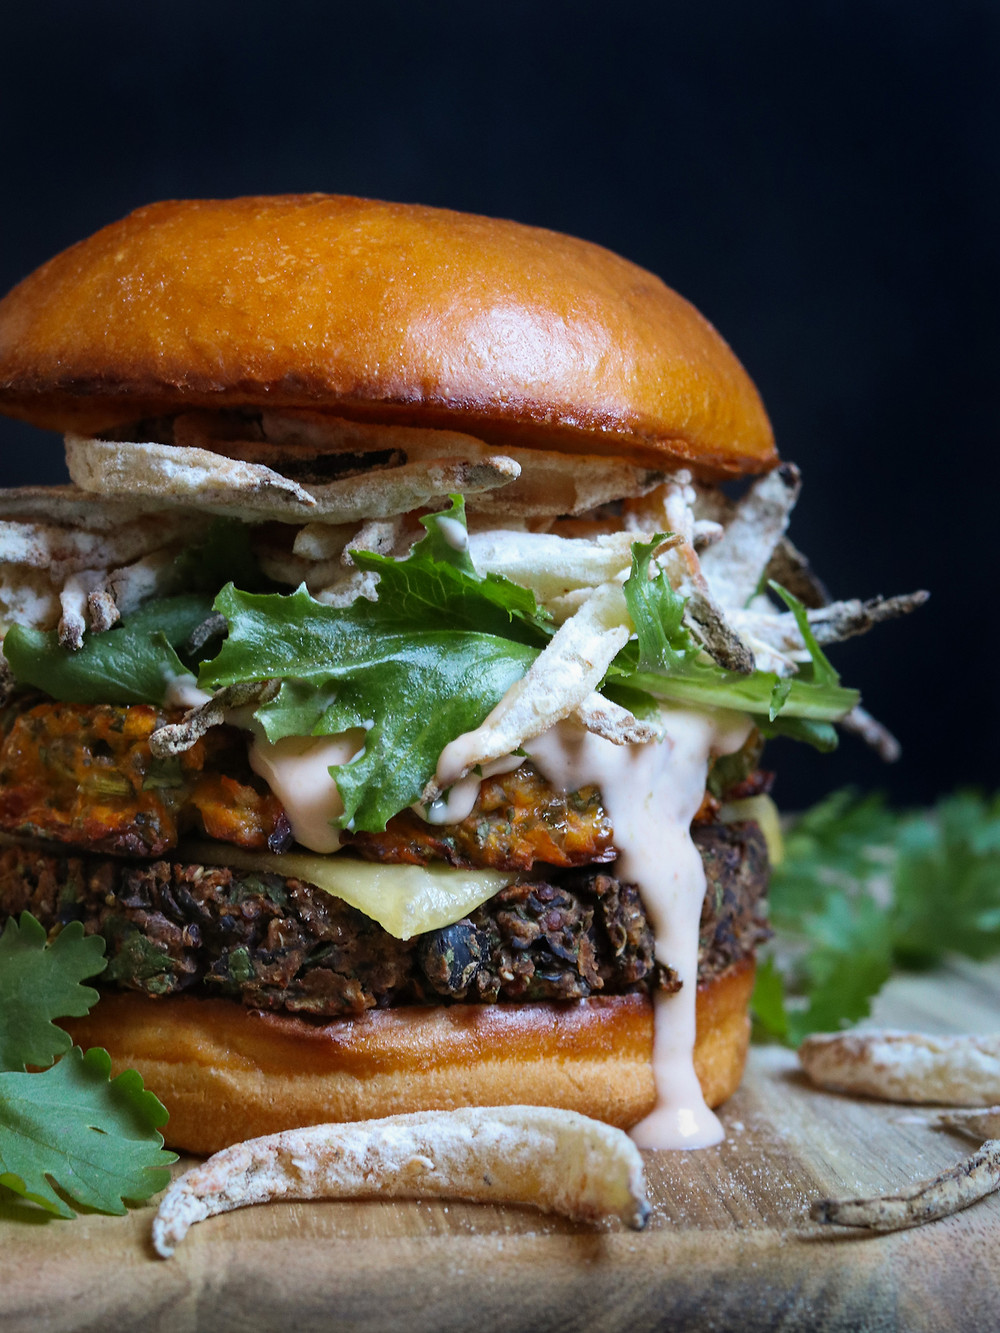 The Hybrid Burger served with Black Bean Burger, Sweet Potato Rösti, Crispy Onion Strips, Vegan Smoked Gouda, and Sriracha Aioli on a Brioche Bun